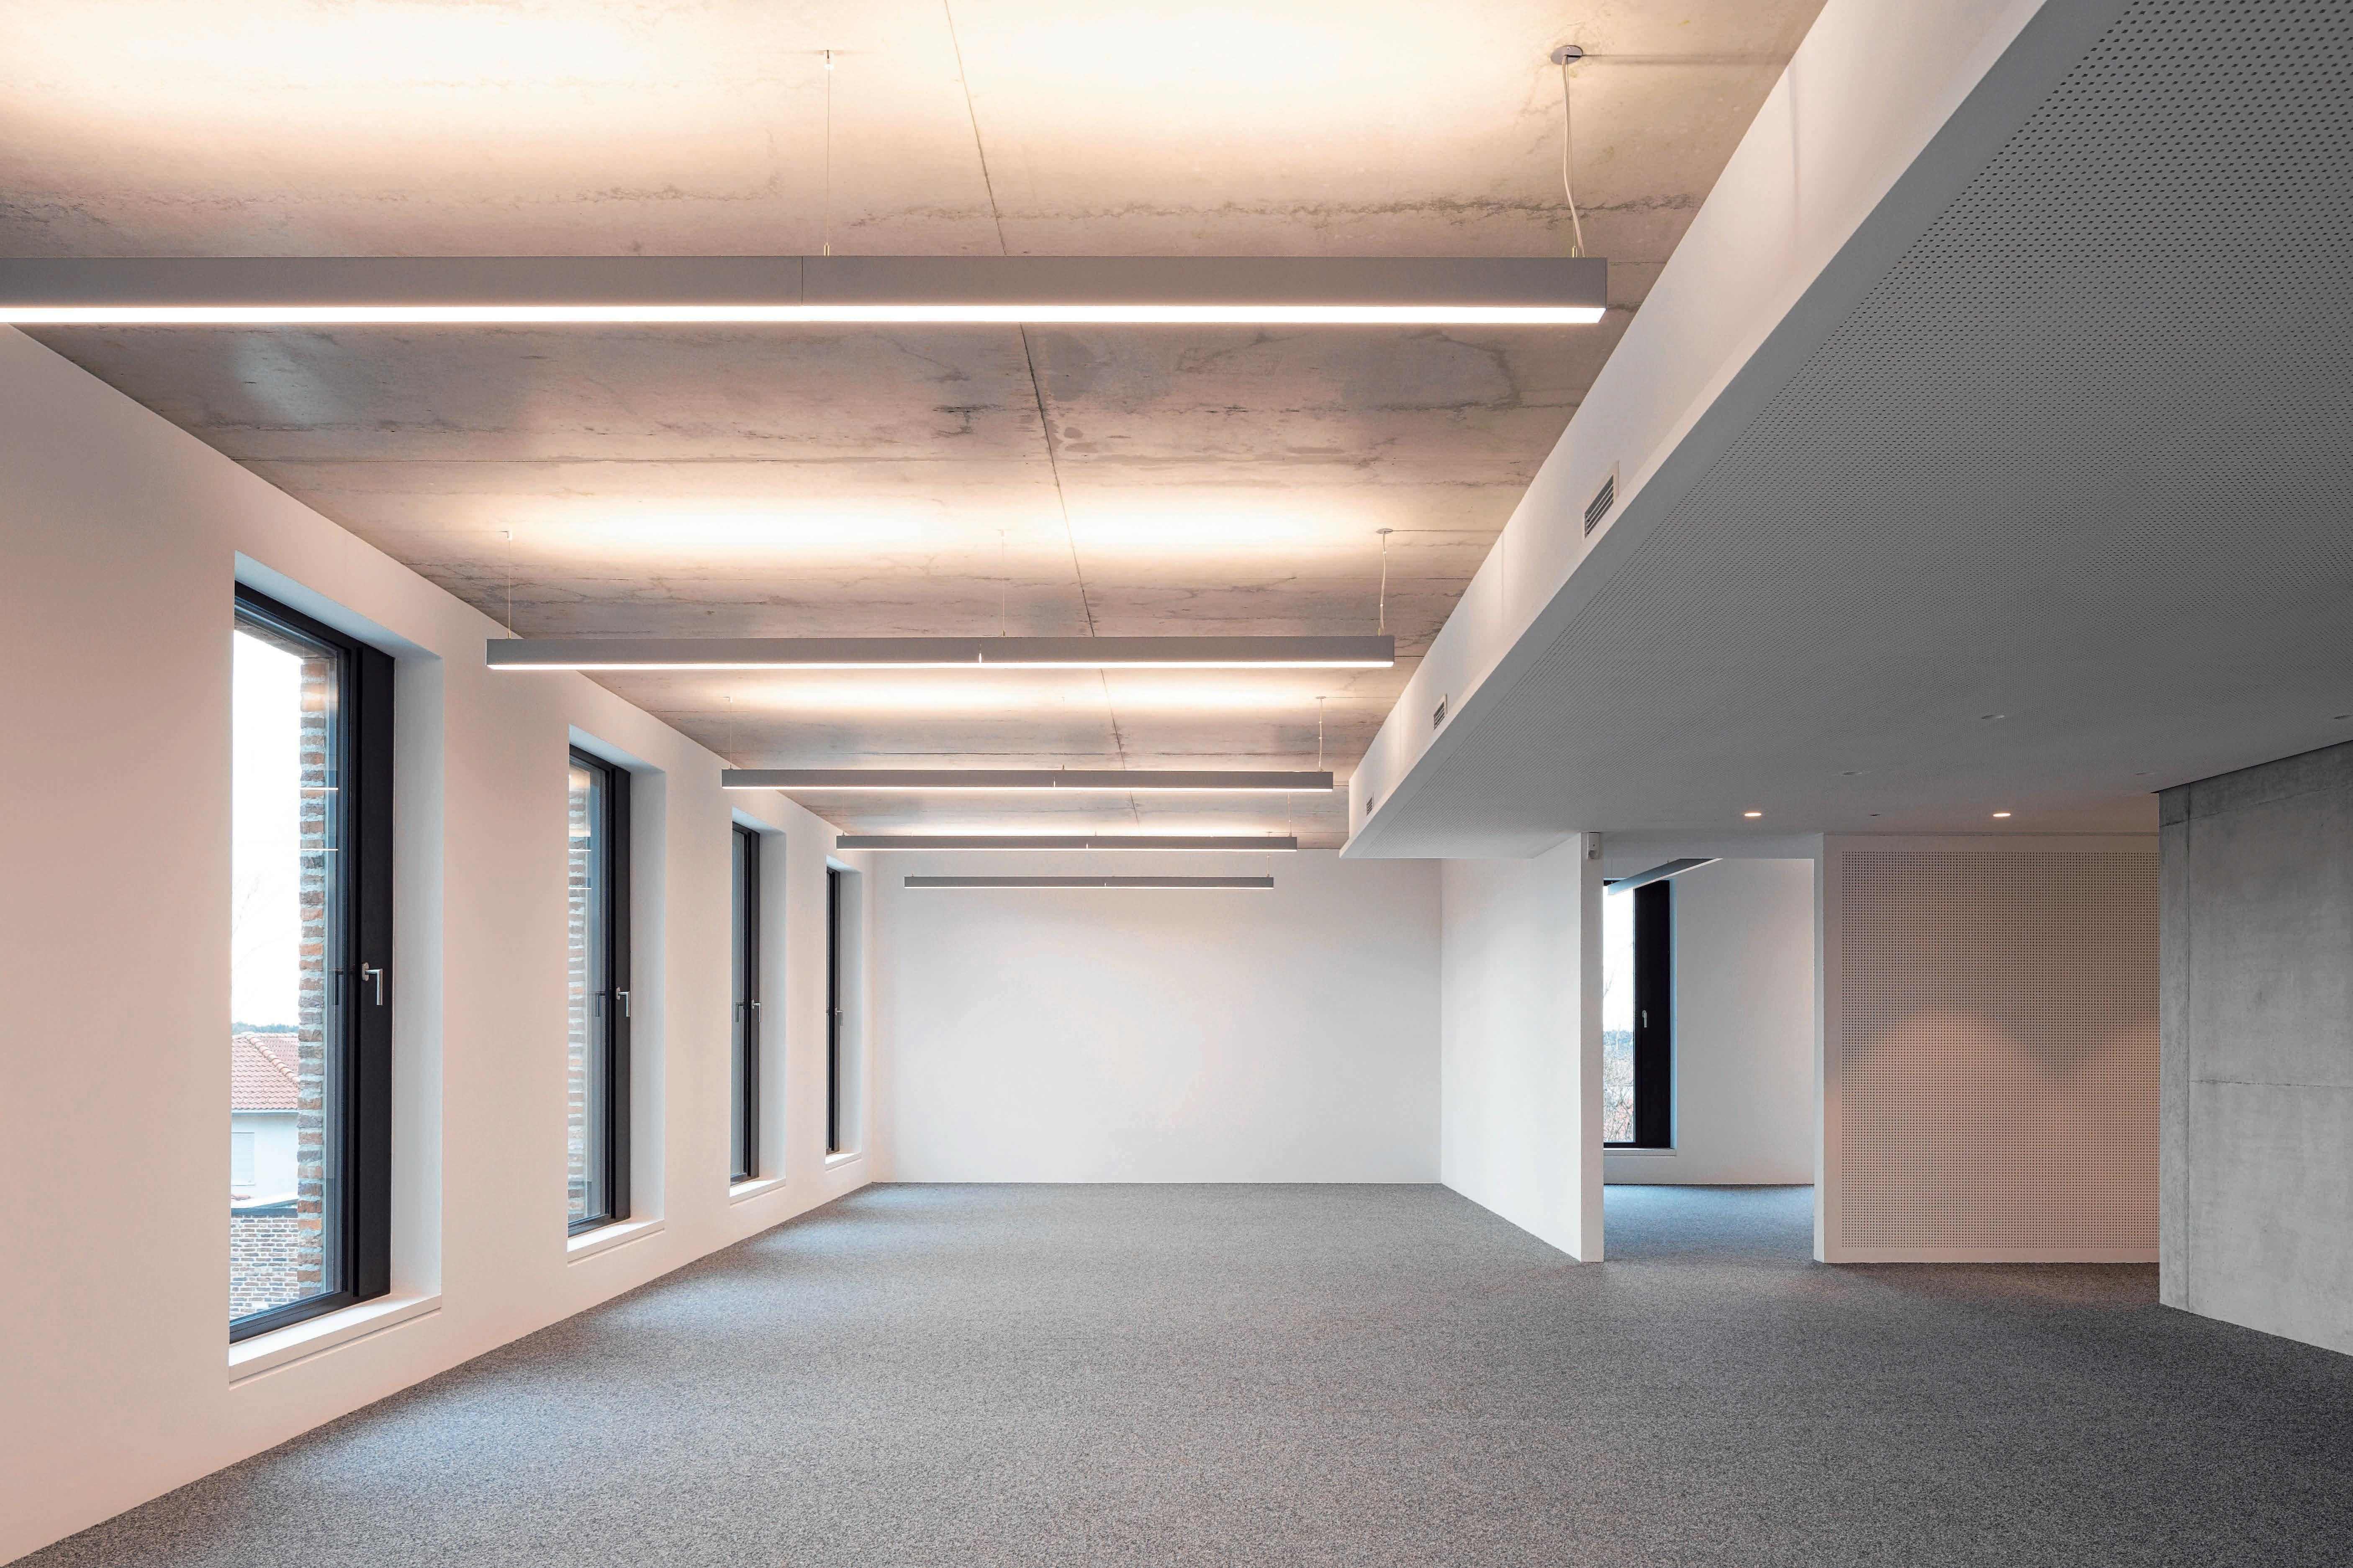 Neues Gebäude bezogen Image 1